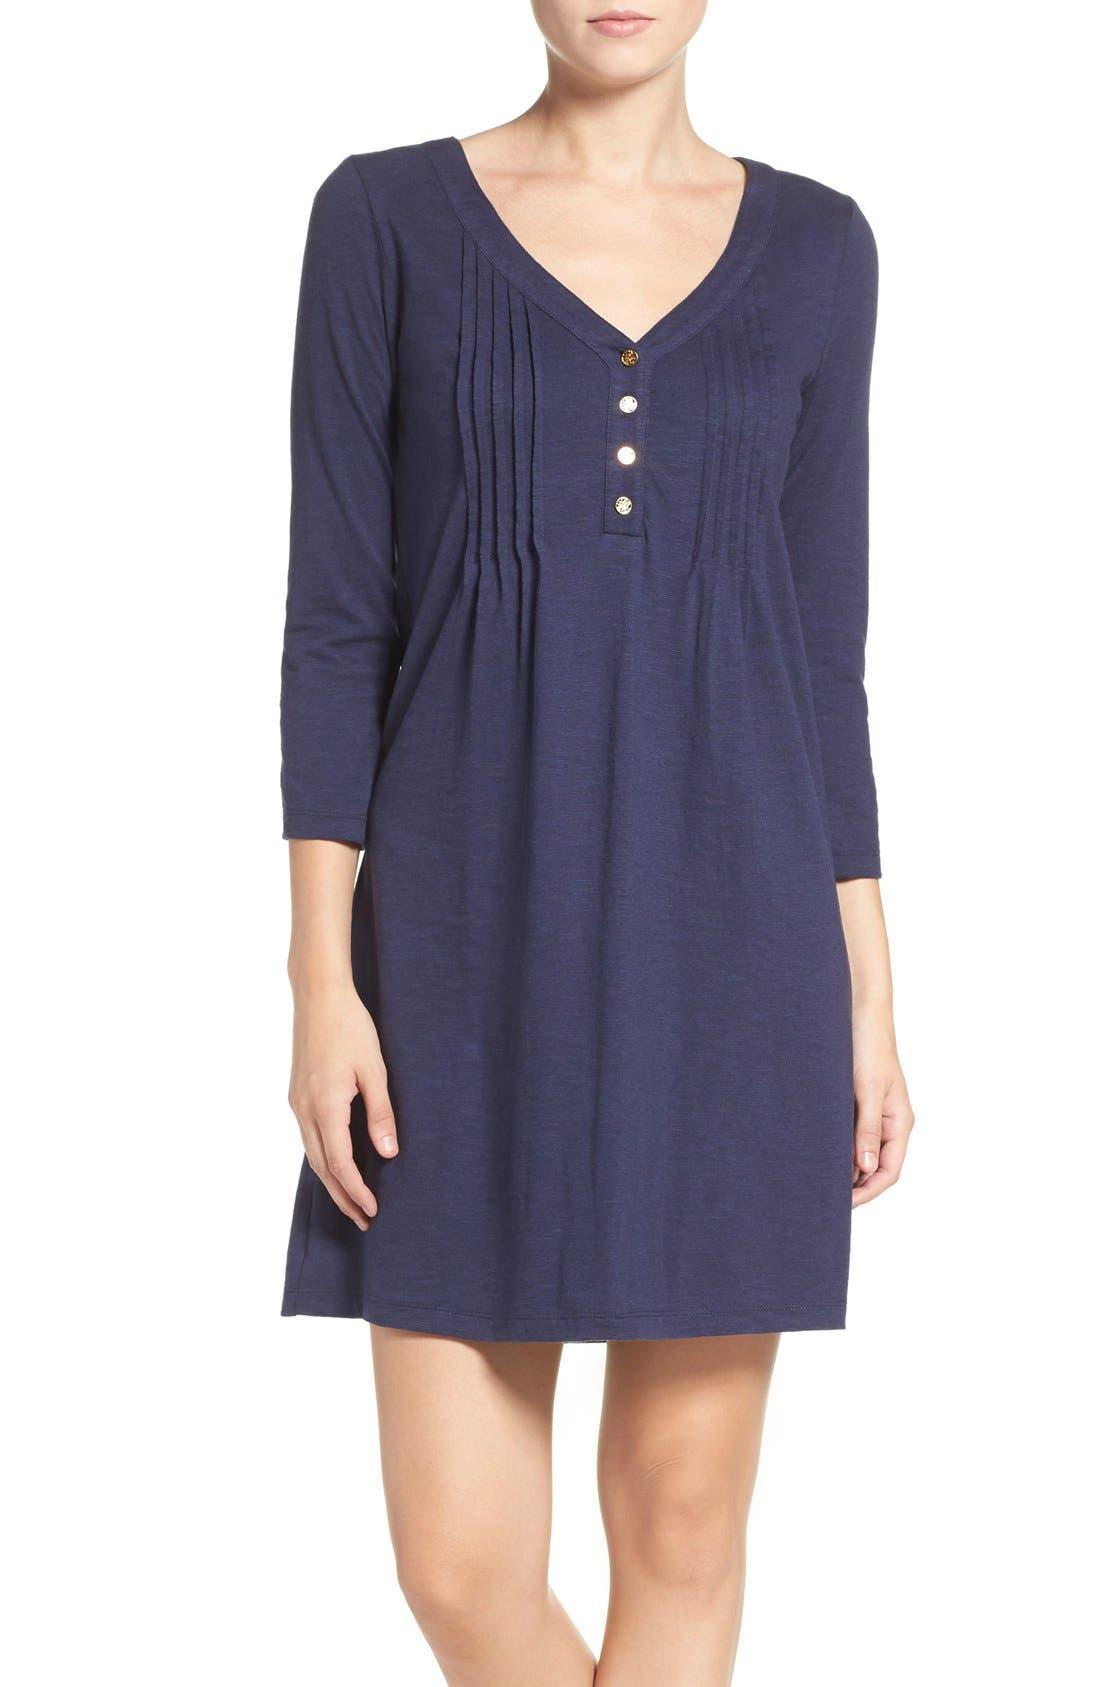 Alternate Image 1 Selected - Lilly Pulitzer® 'Amberly' Jersey T-Shirt Dress